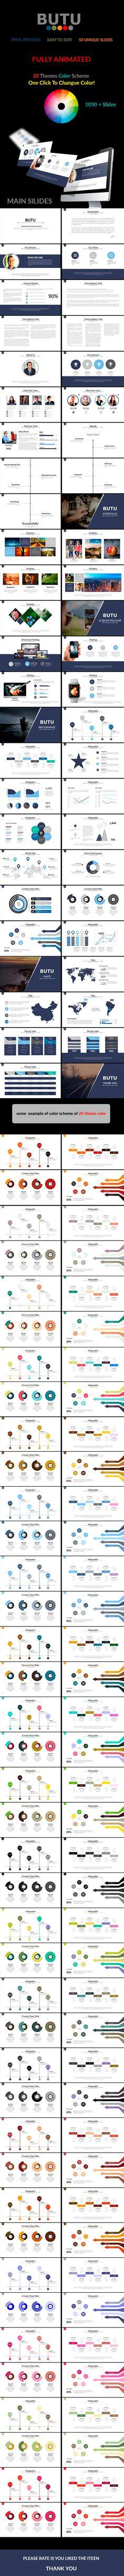 Butu V.3 Powerpoint Presentation (PowerPoint Templates)